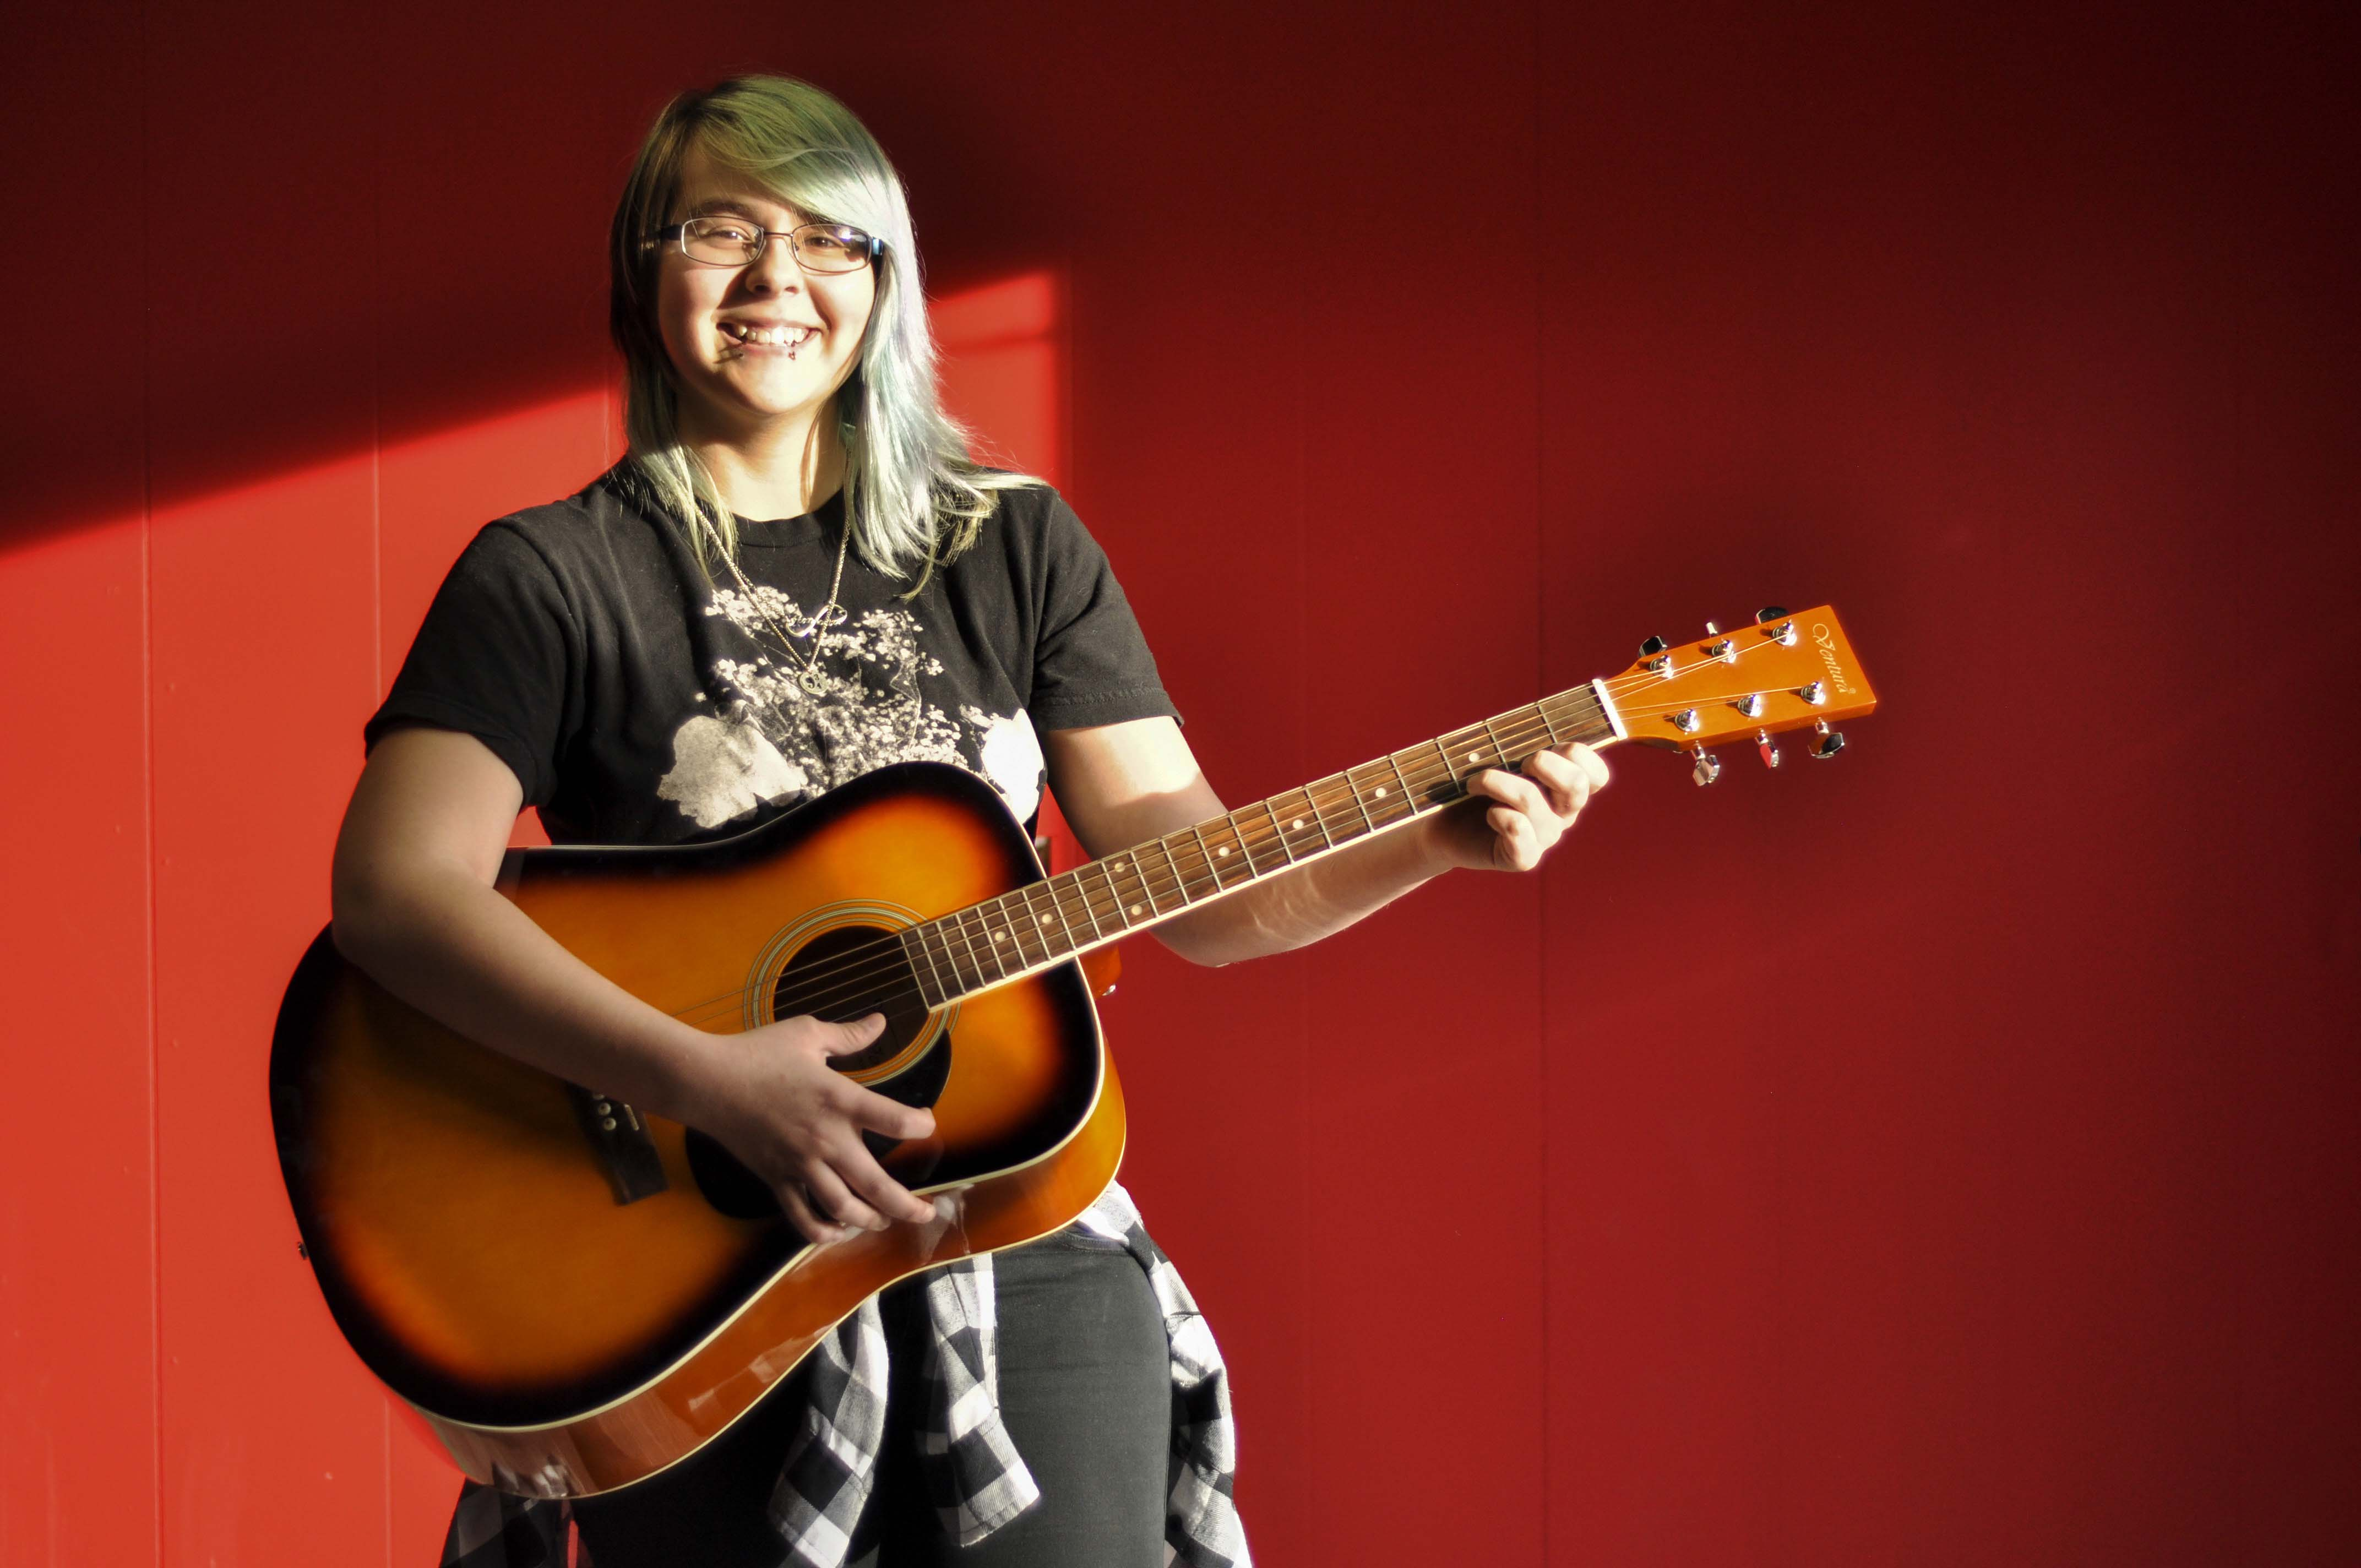 student guitar lessons kansas city